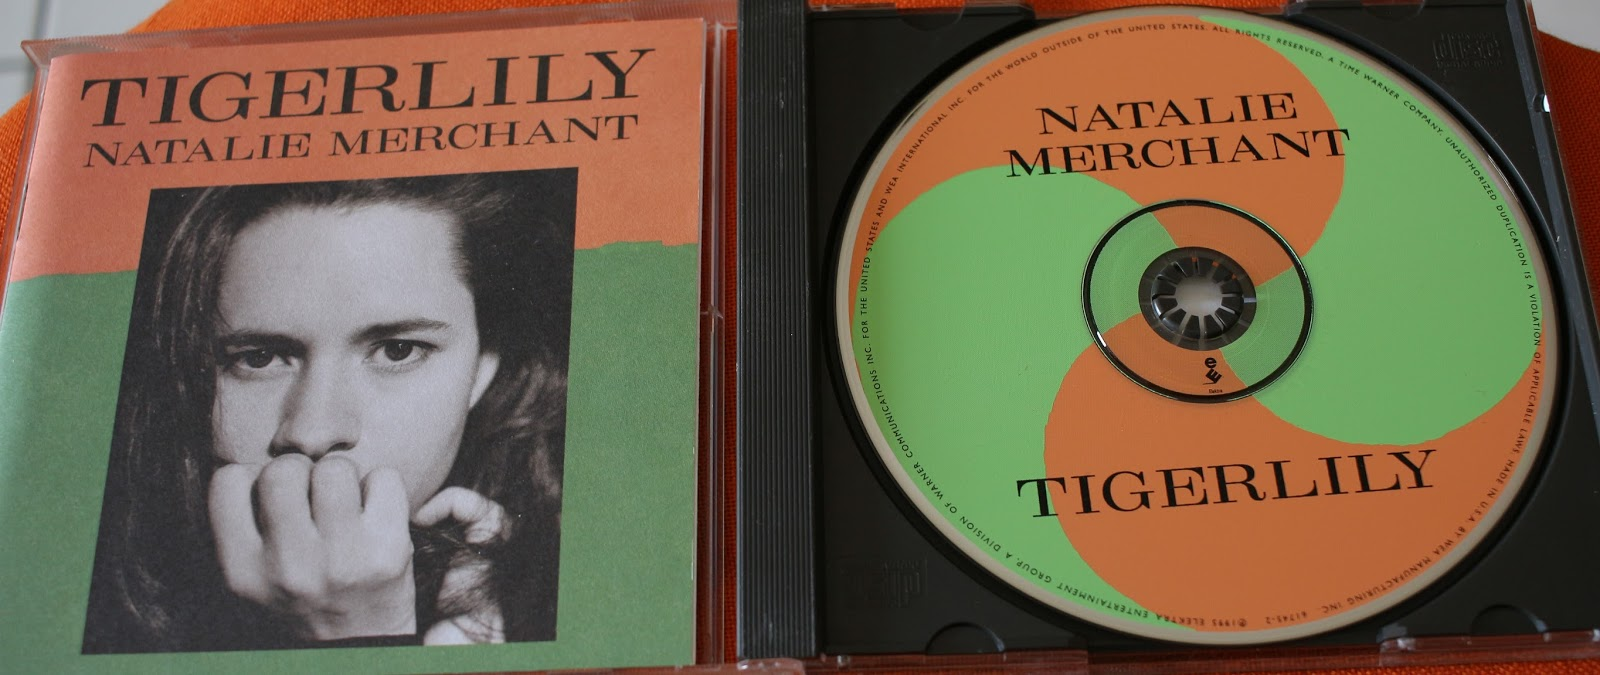 tigerlily natalie merchant - 1600×675